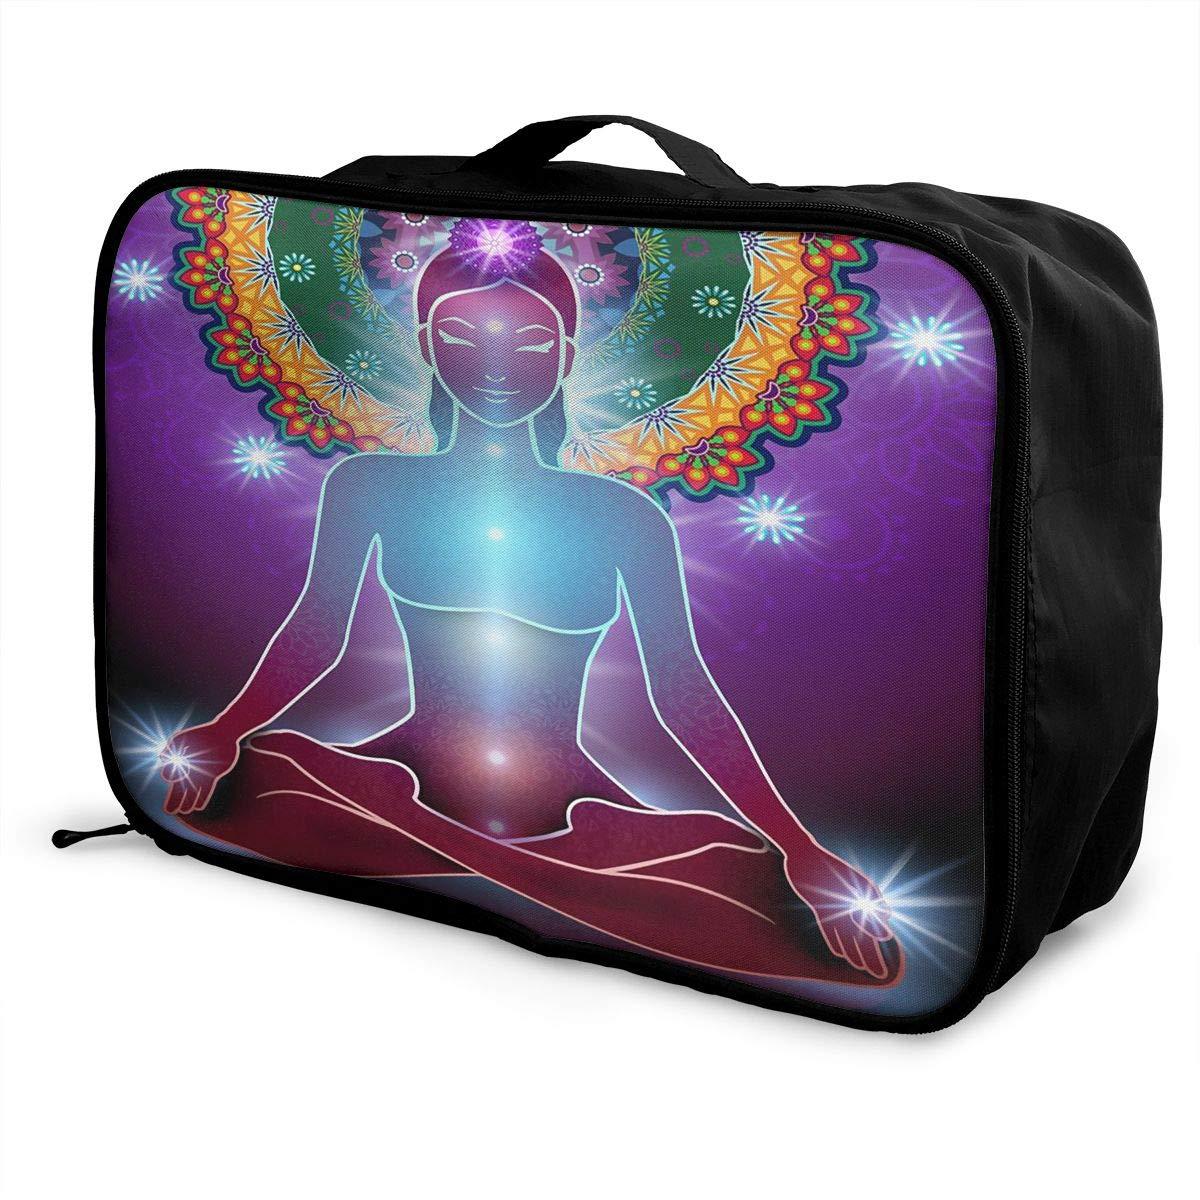 SSZW Yoga Women Travel Duffel Bag Waterproof Fashion Lightweight Large Capacity Portable Luggage Bag